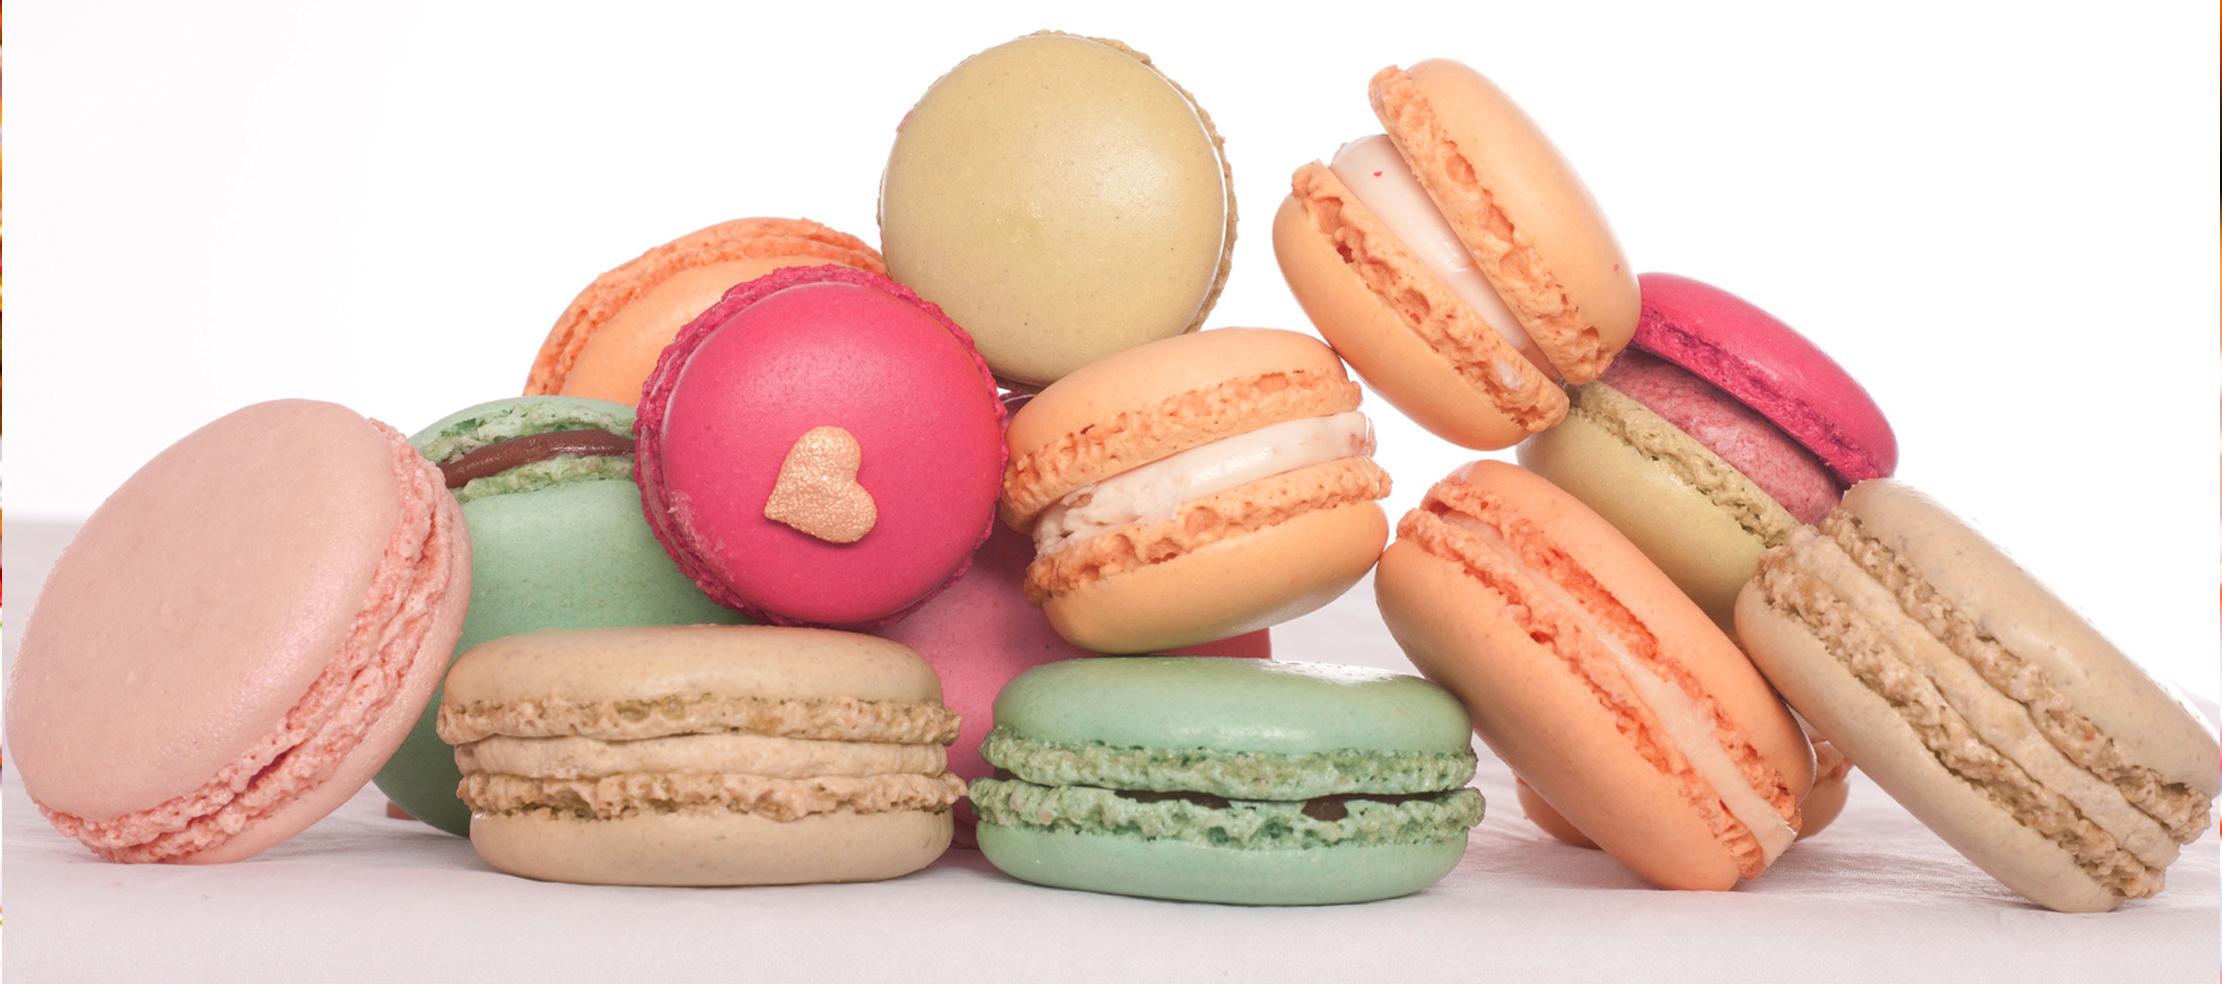 Macarons 21 11 16